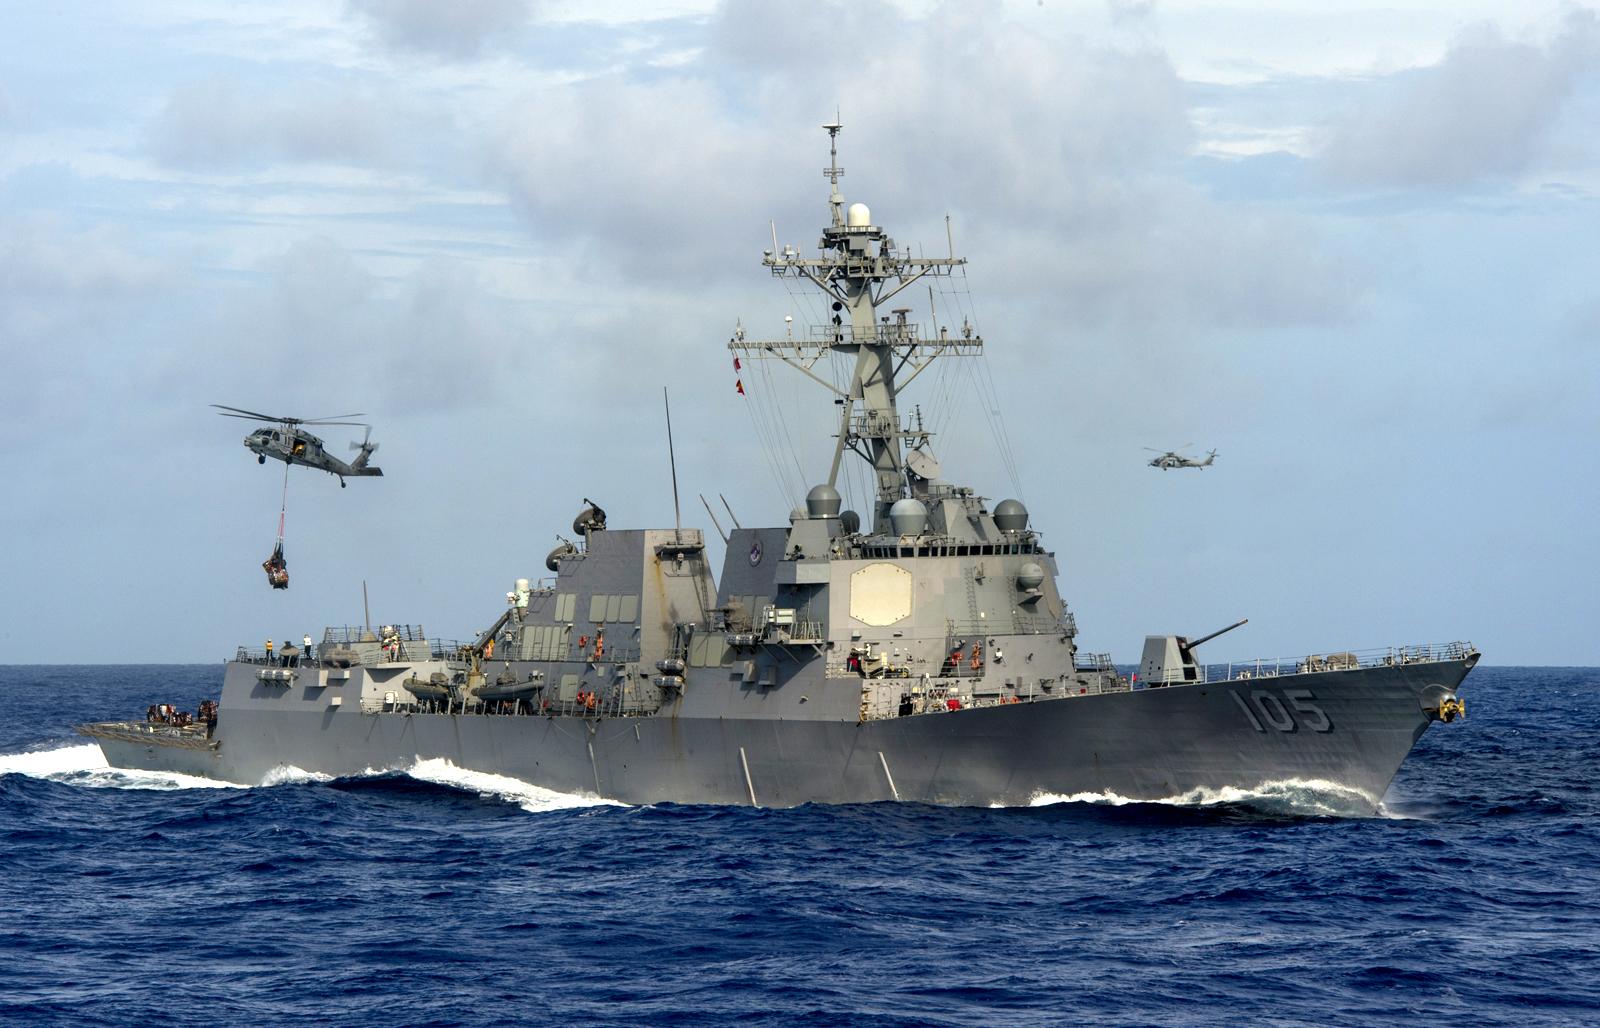 USS Dewey conducting a replenishment